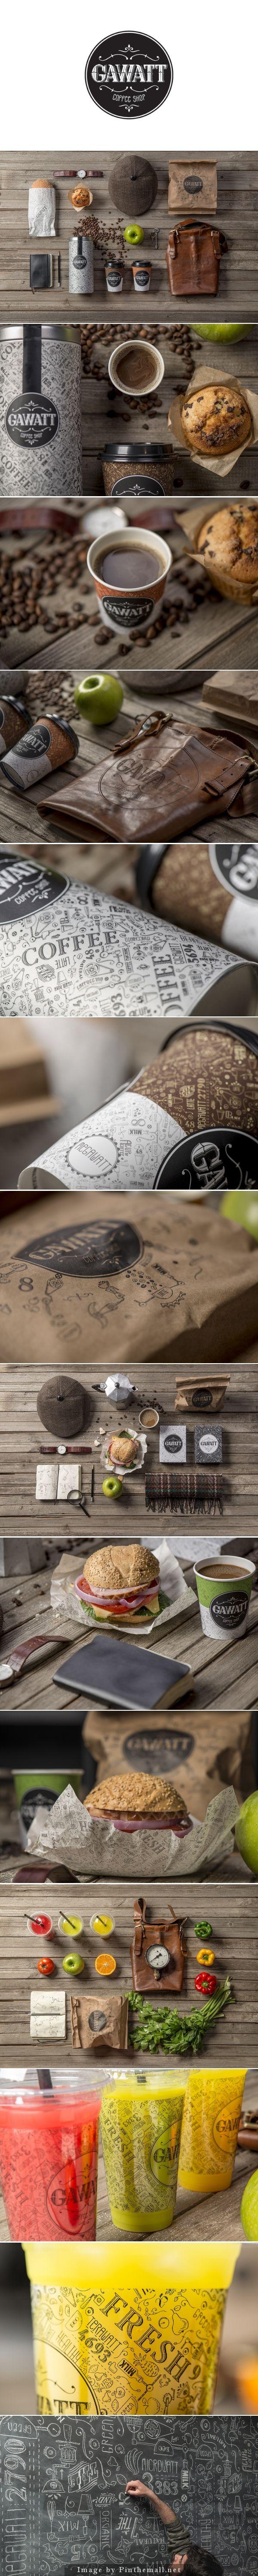 Coffee Shop Branding: Gawatt Take-Out Coffee created by Stepan Azaryan, Karen Gevorgyan and Armenak Grigoryan